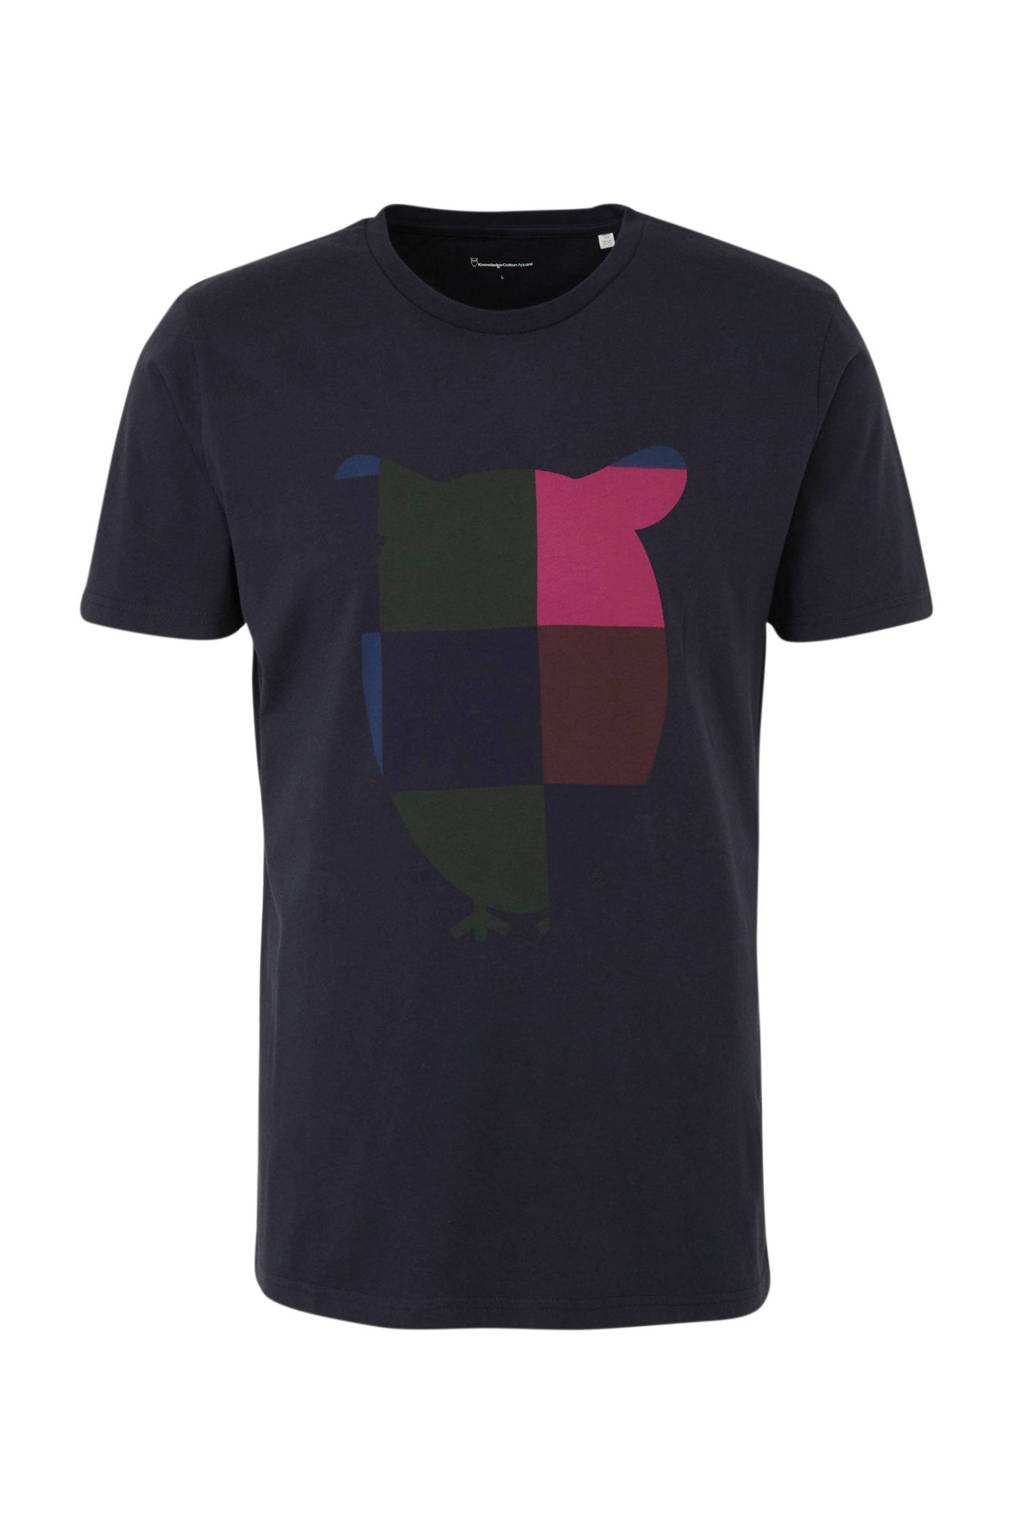 Knowledge Cotton Apparel T-shirt met printopdruk donkerblauw/groen/roze/zwart, Donkerblauw/groen/roze/zwart